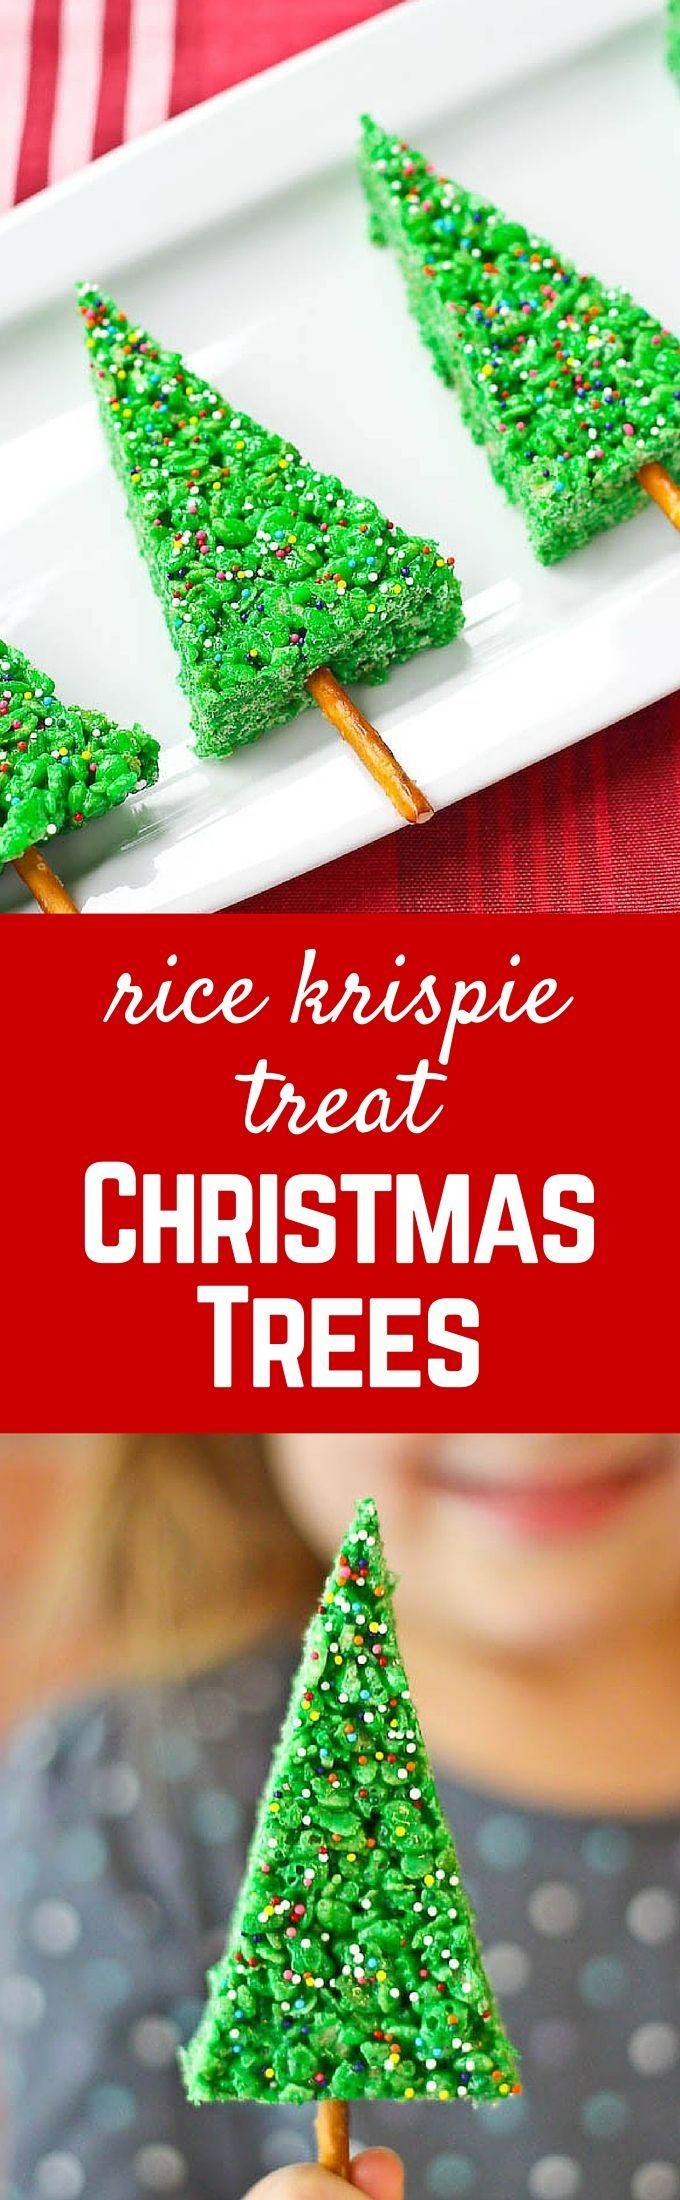 Easy Christmas Tree Rice Krispie Treats